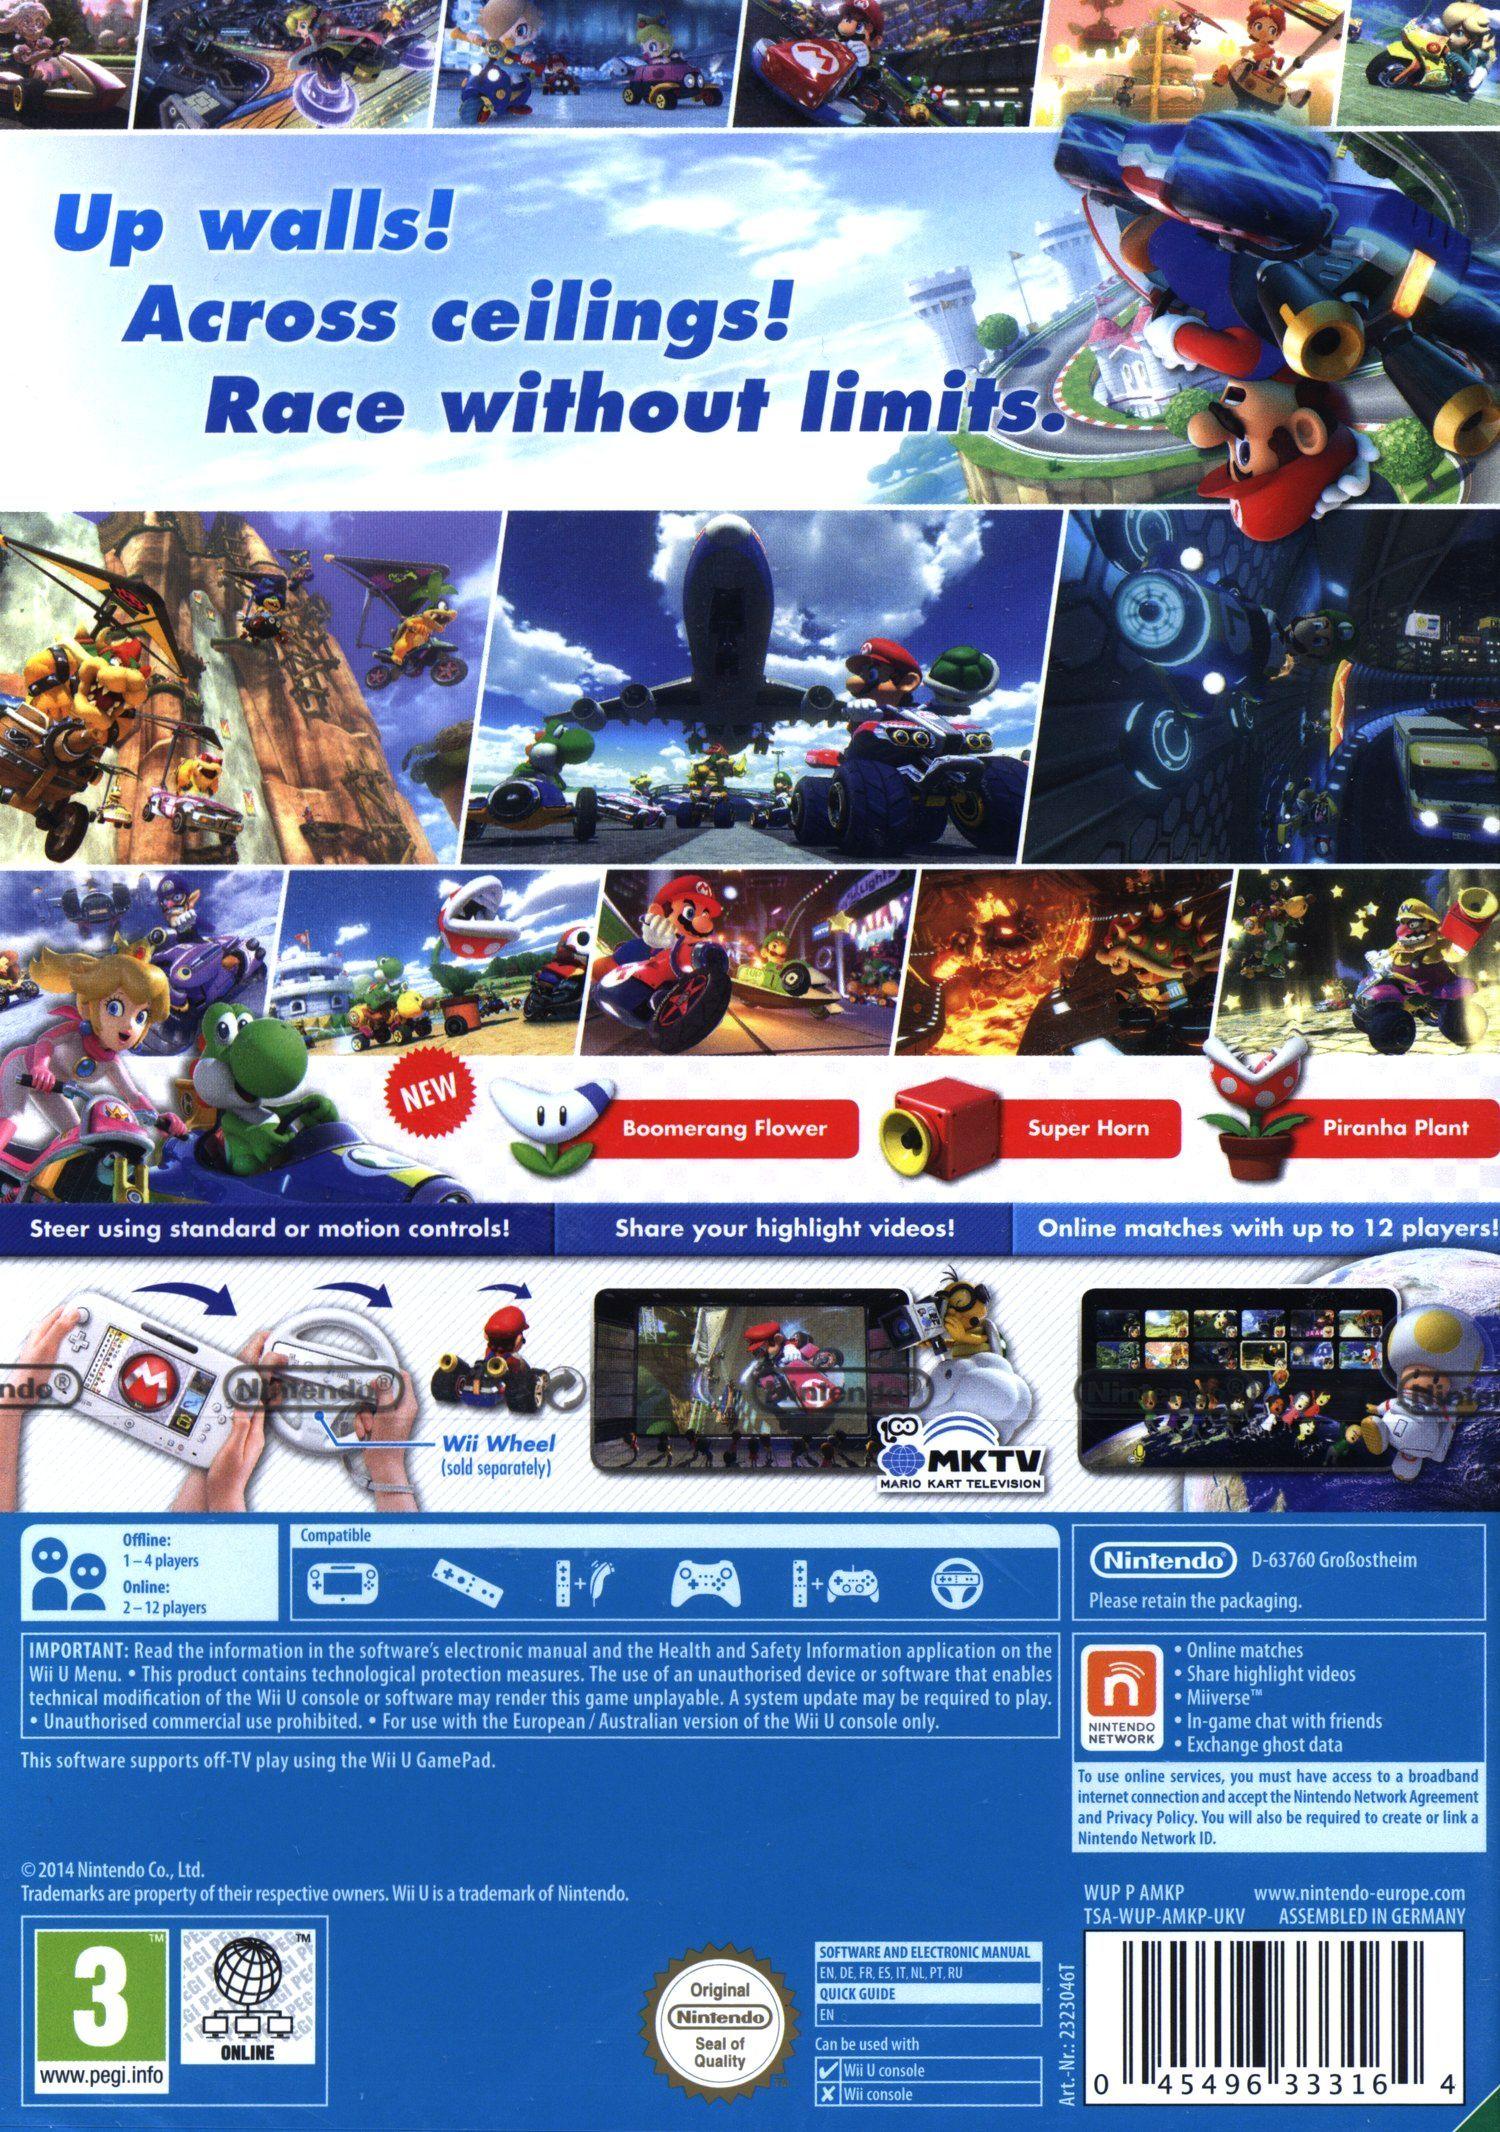 Mario Kart 8 (Wii U) - 5